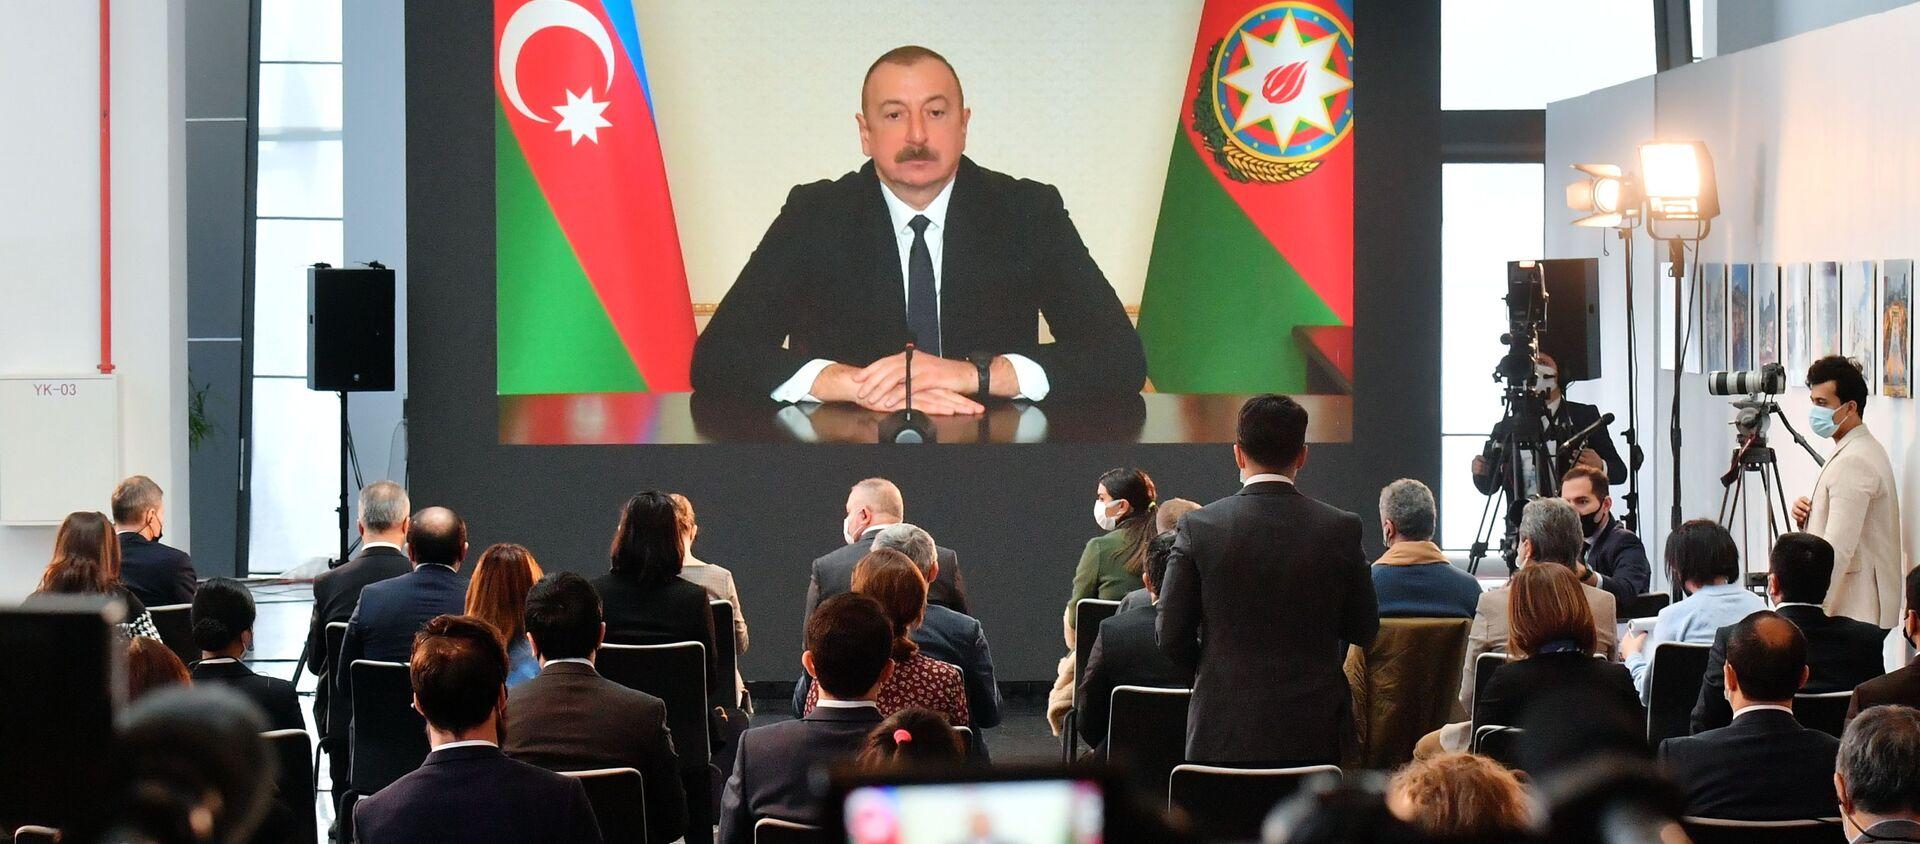 Пресс-конференция президента Азербайджана Ильхама Алиева в Баку - Sputnik Азербайджан, 1920, 26.02.2021